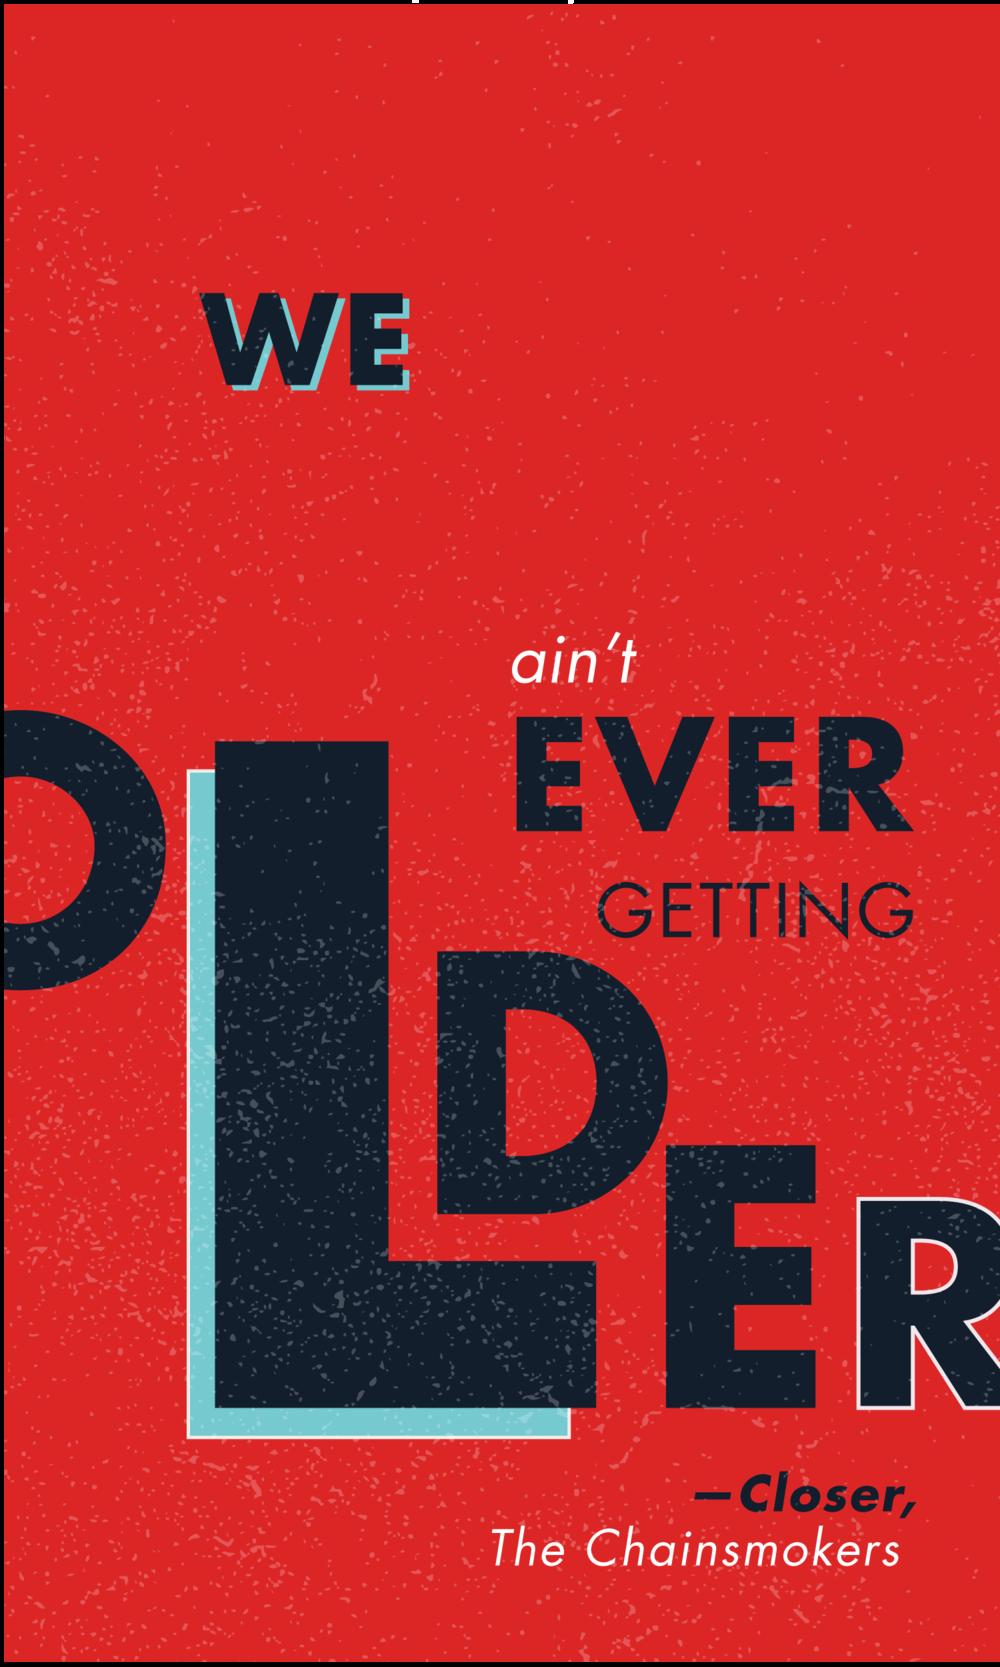 Closer Lyric Design | You've Got Flair